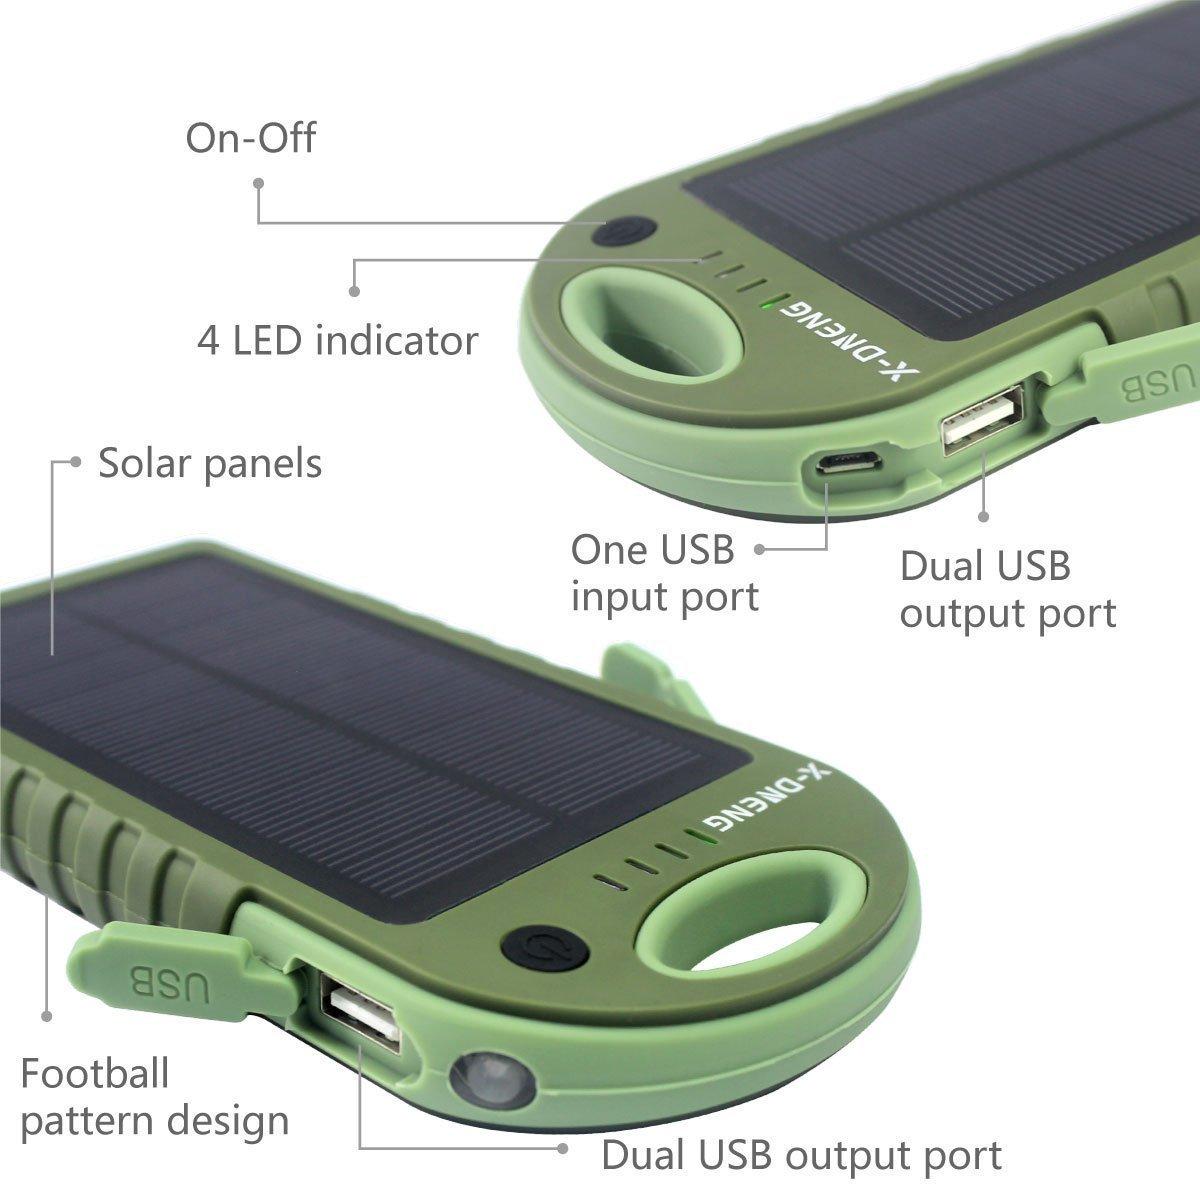 Externe Akku Powerbank 12000 mAh Solar Ladegerät Handy X-DNENG 2 Ausgänge USB Wasserdicht Solar Panel Outdoor Power Bank mit LED-Lampen für iPhone iPad Tablet Samsung Android Smartphones Mp3 usw- Grün